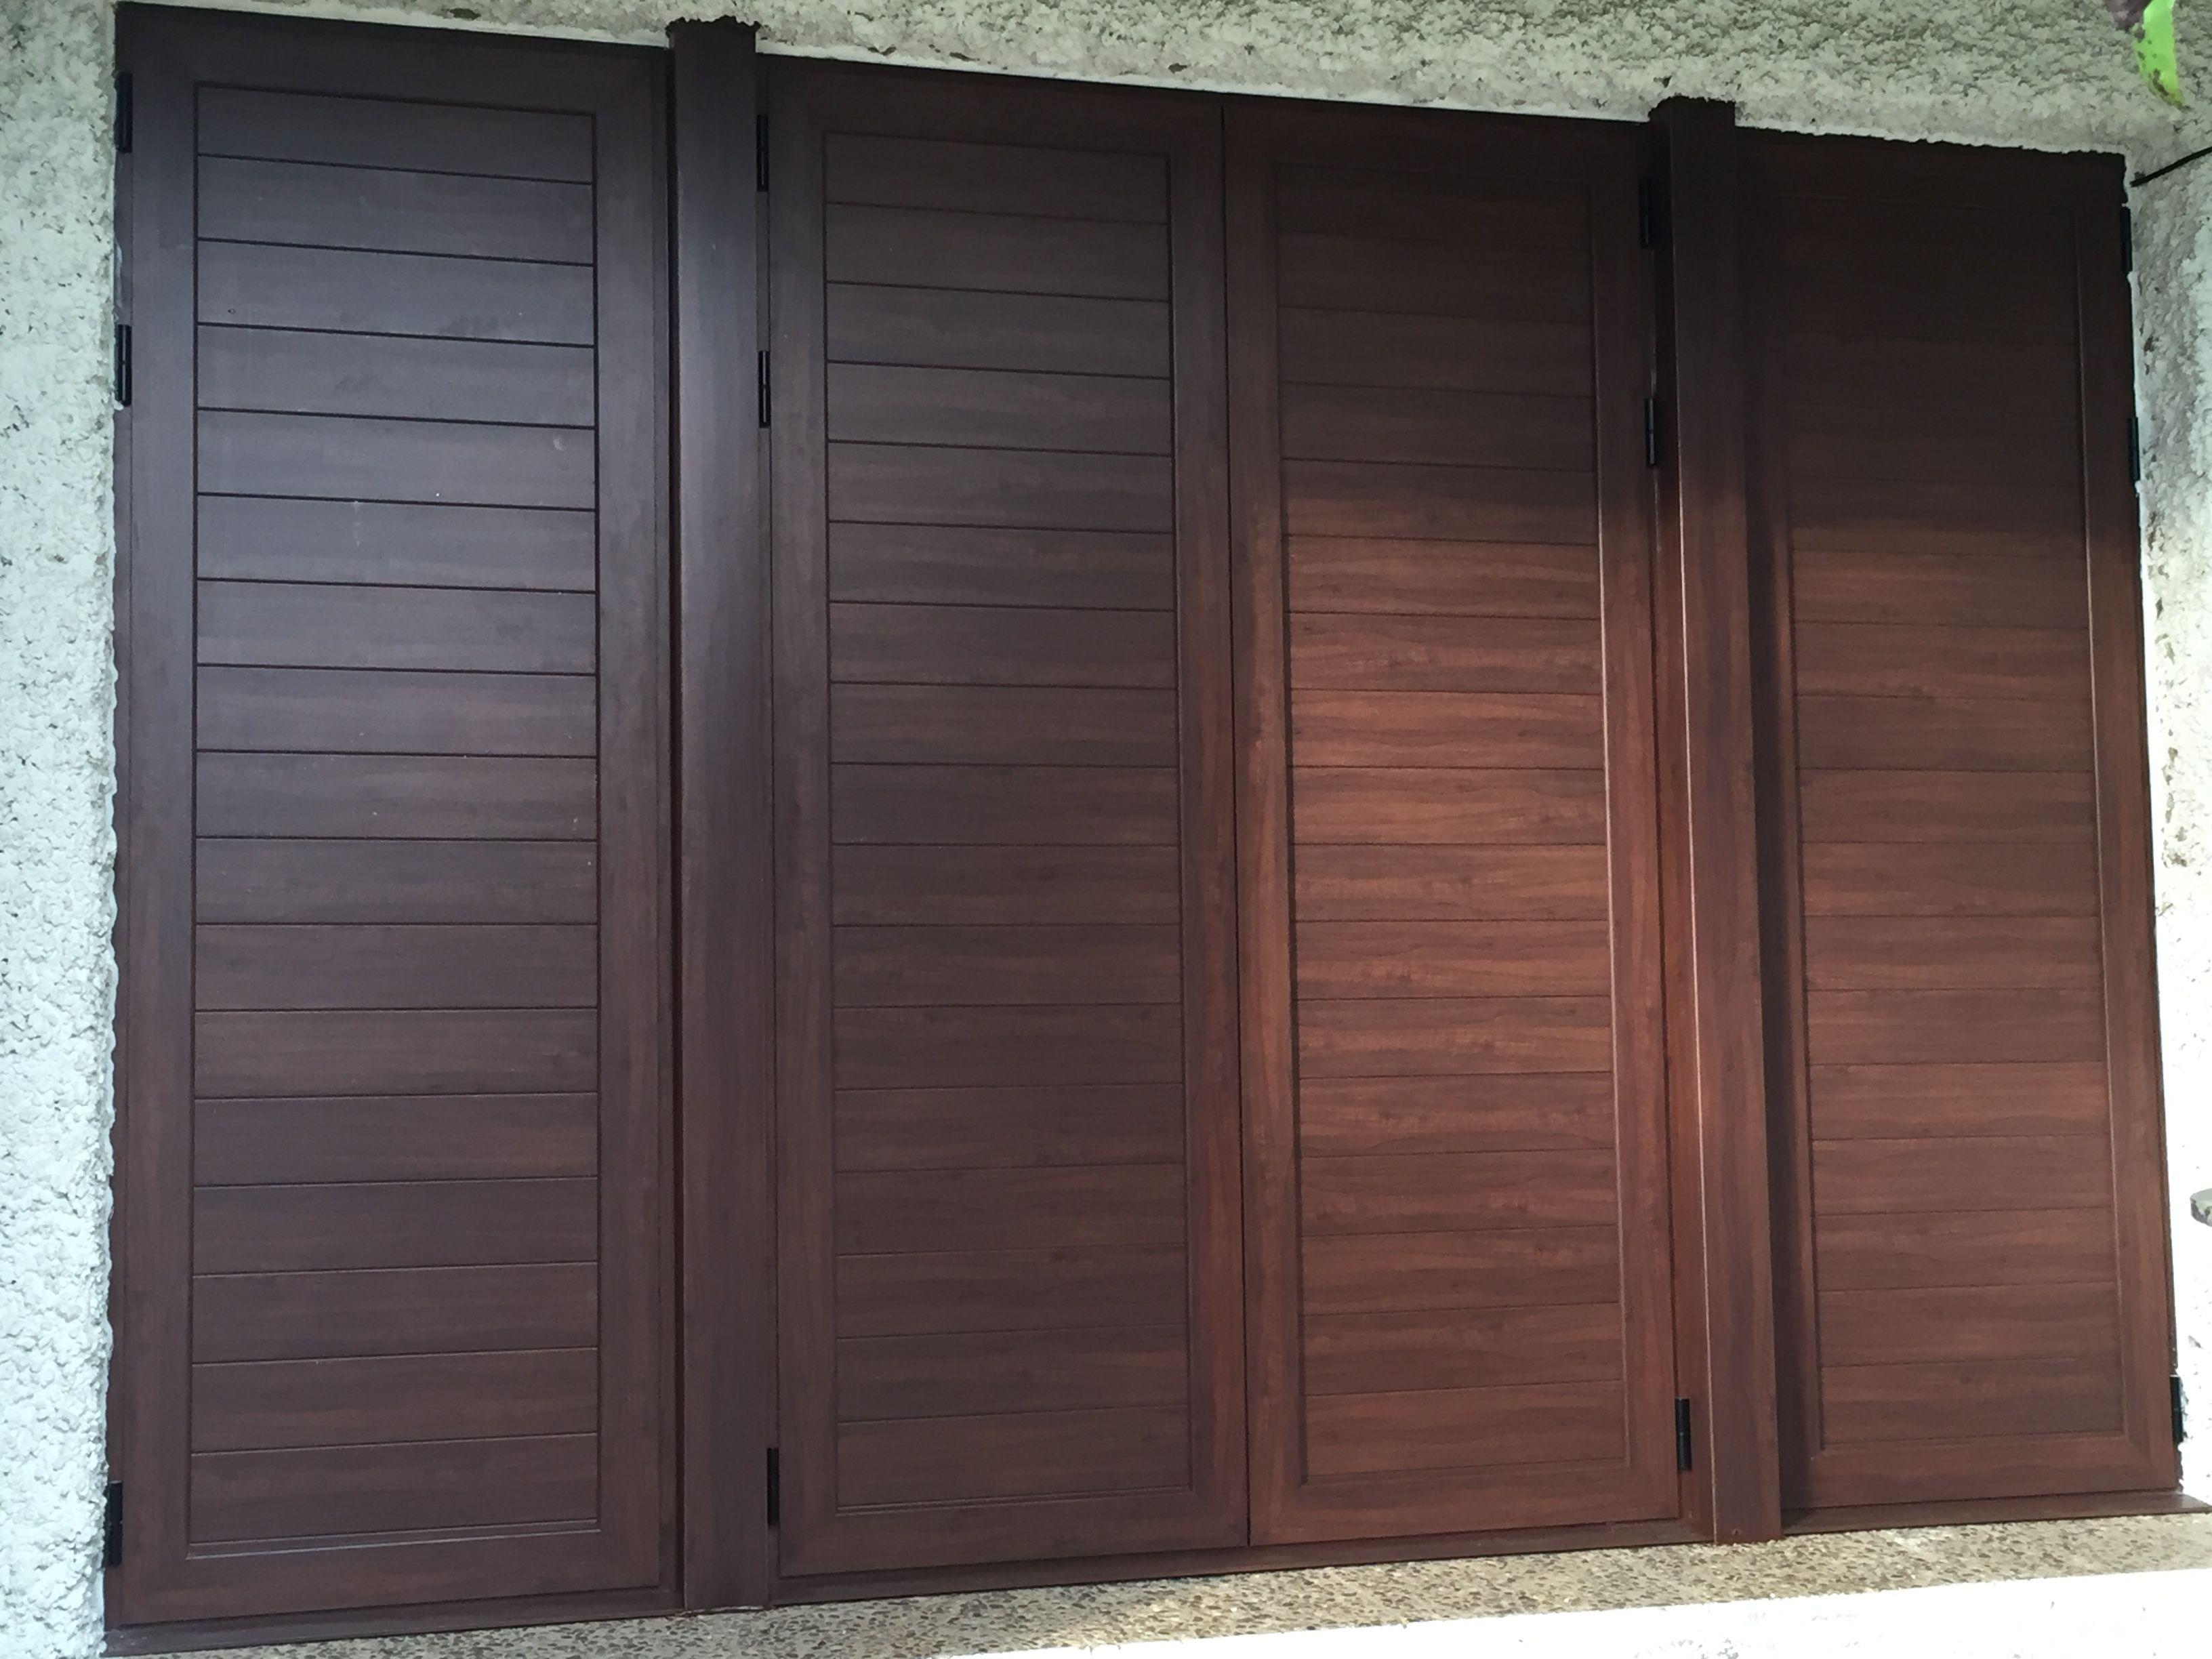 Preciosa mallorquina imitaci n madera fabricada por for Puertas imitacion madera exterior